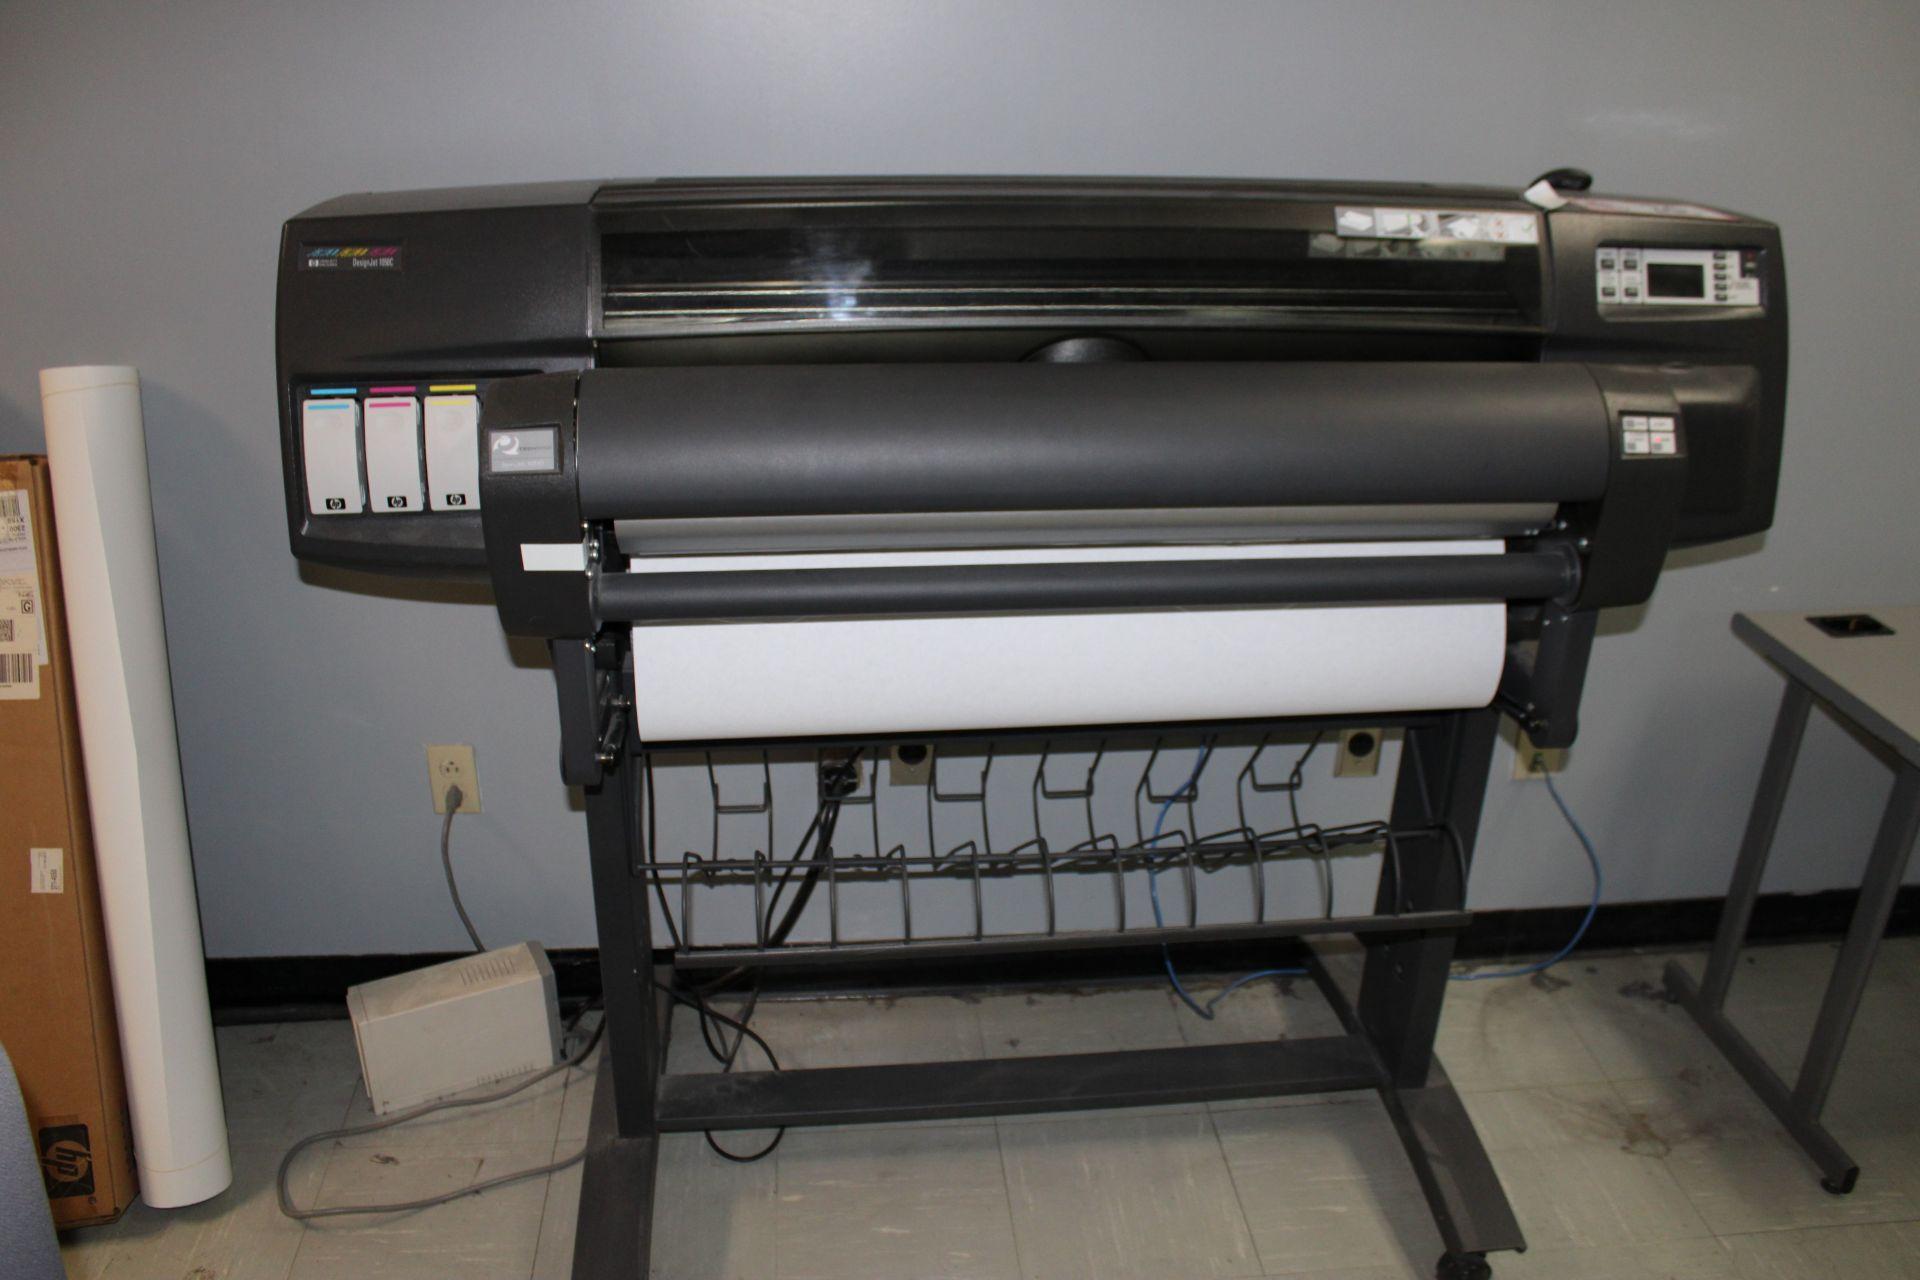 Lot 26 - HP Design Jet 1050C Wide Format Colored Printer w/ Techsage Spin Jet 1000